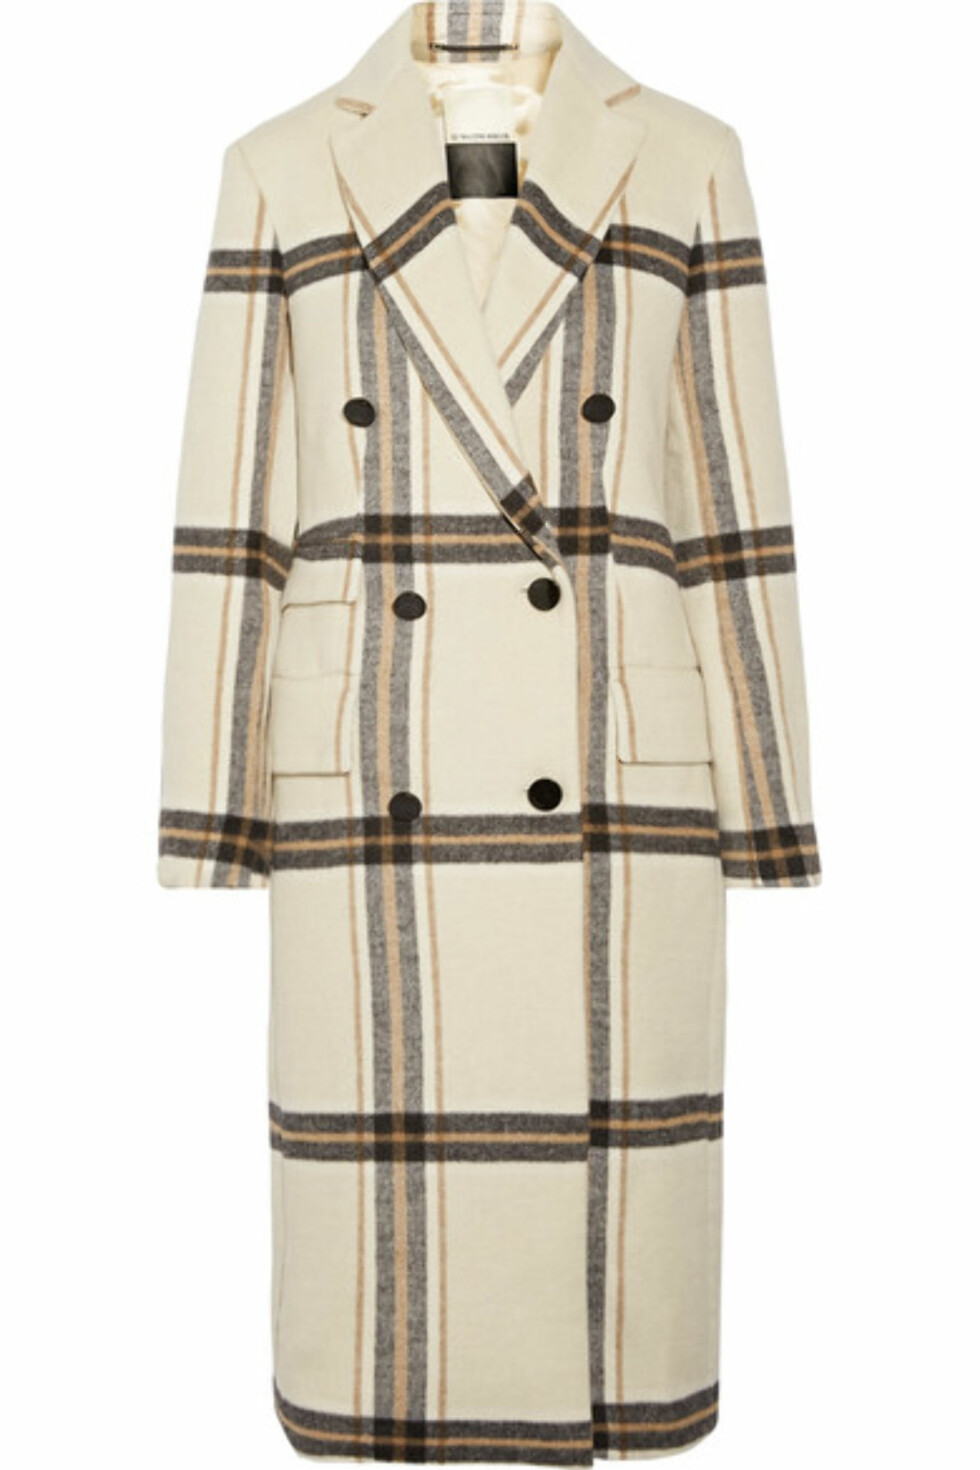 Kåpe fra By Malene Birger via Net-a-porter.com  6000,-  https://www.net-a-porter.com/no/en/product/988734/by_malene_birger/gritt-double-breasted-plaid-brushed-felt-coat